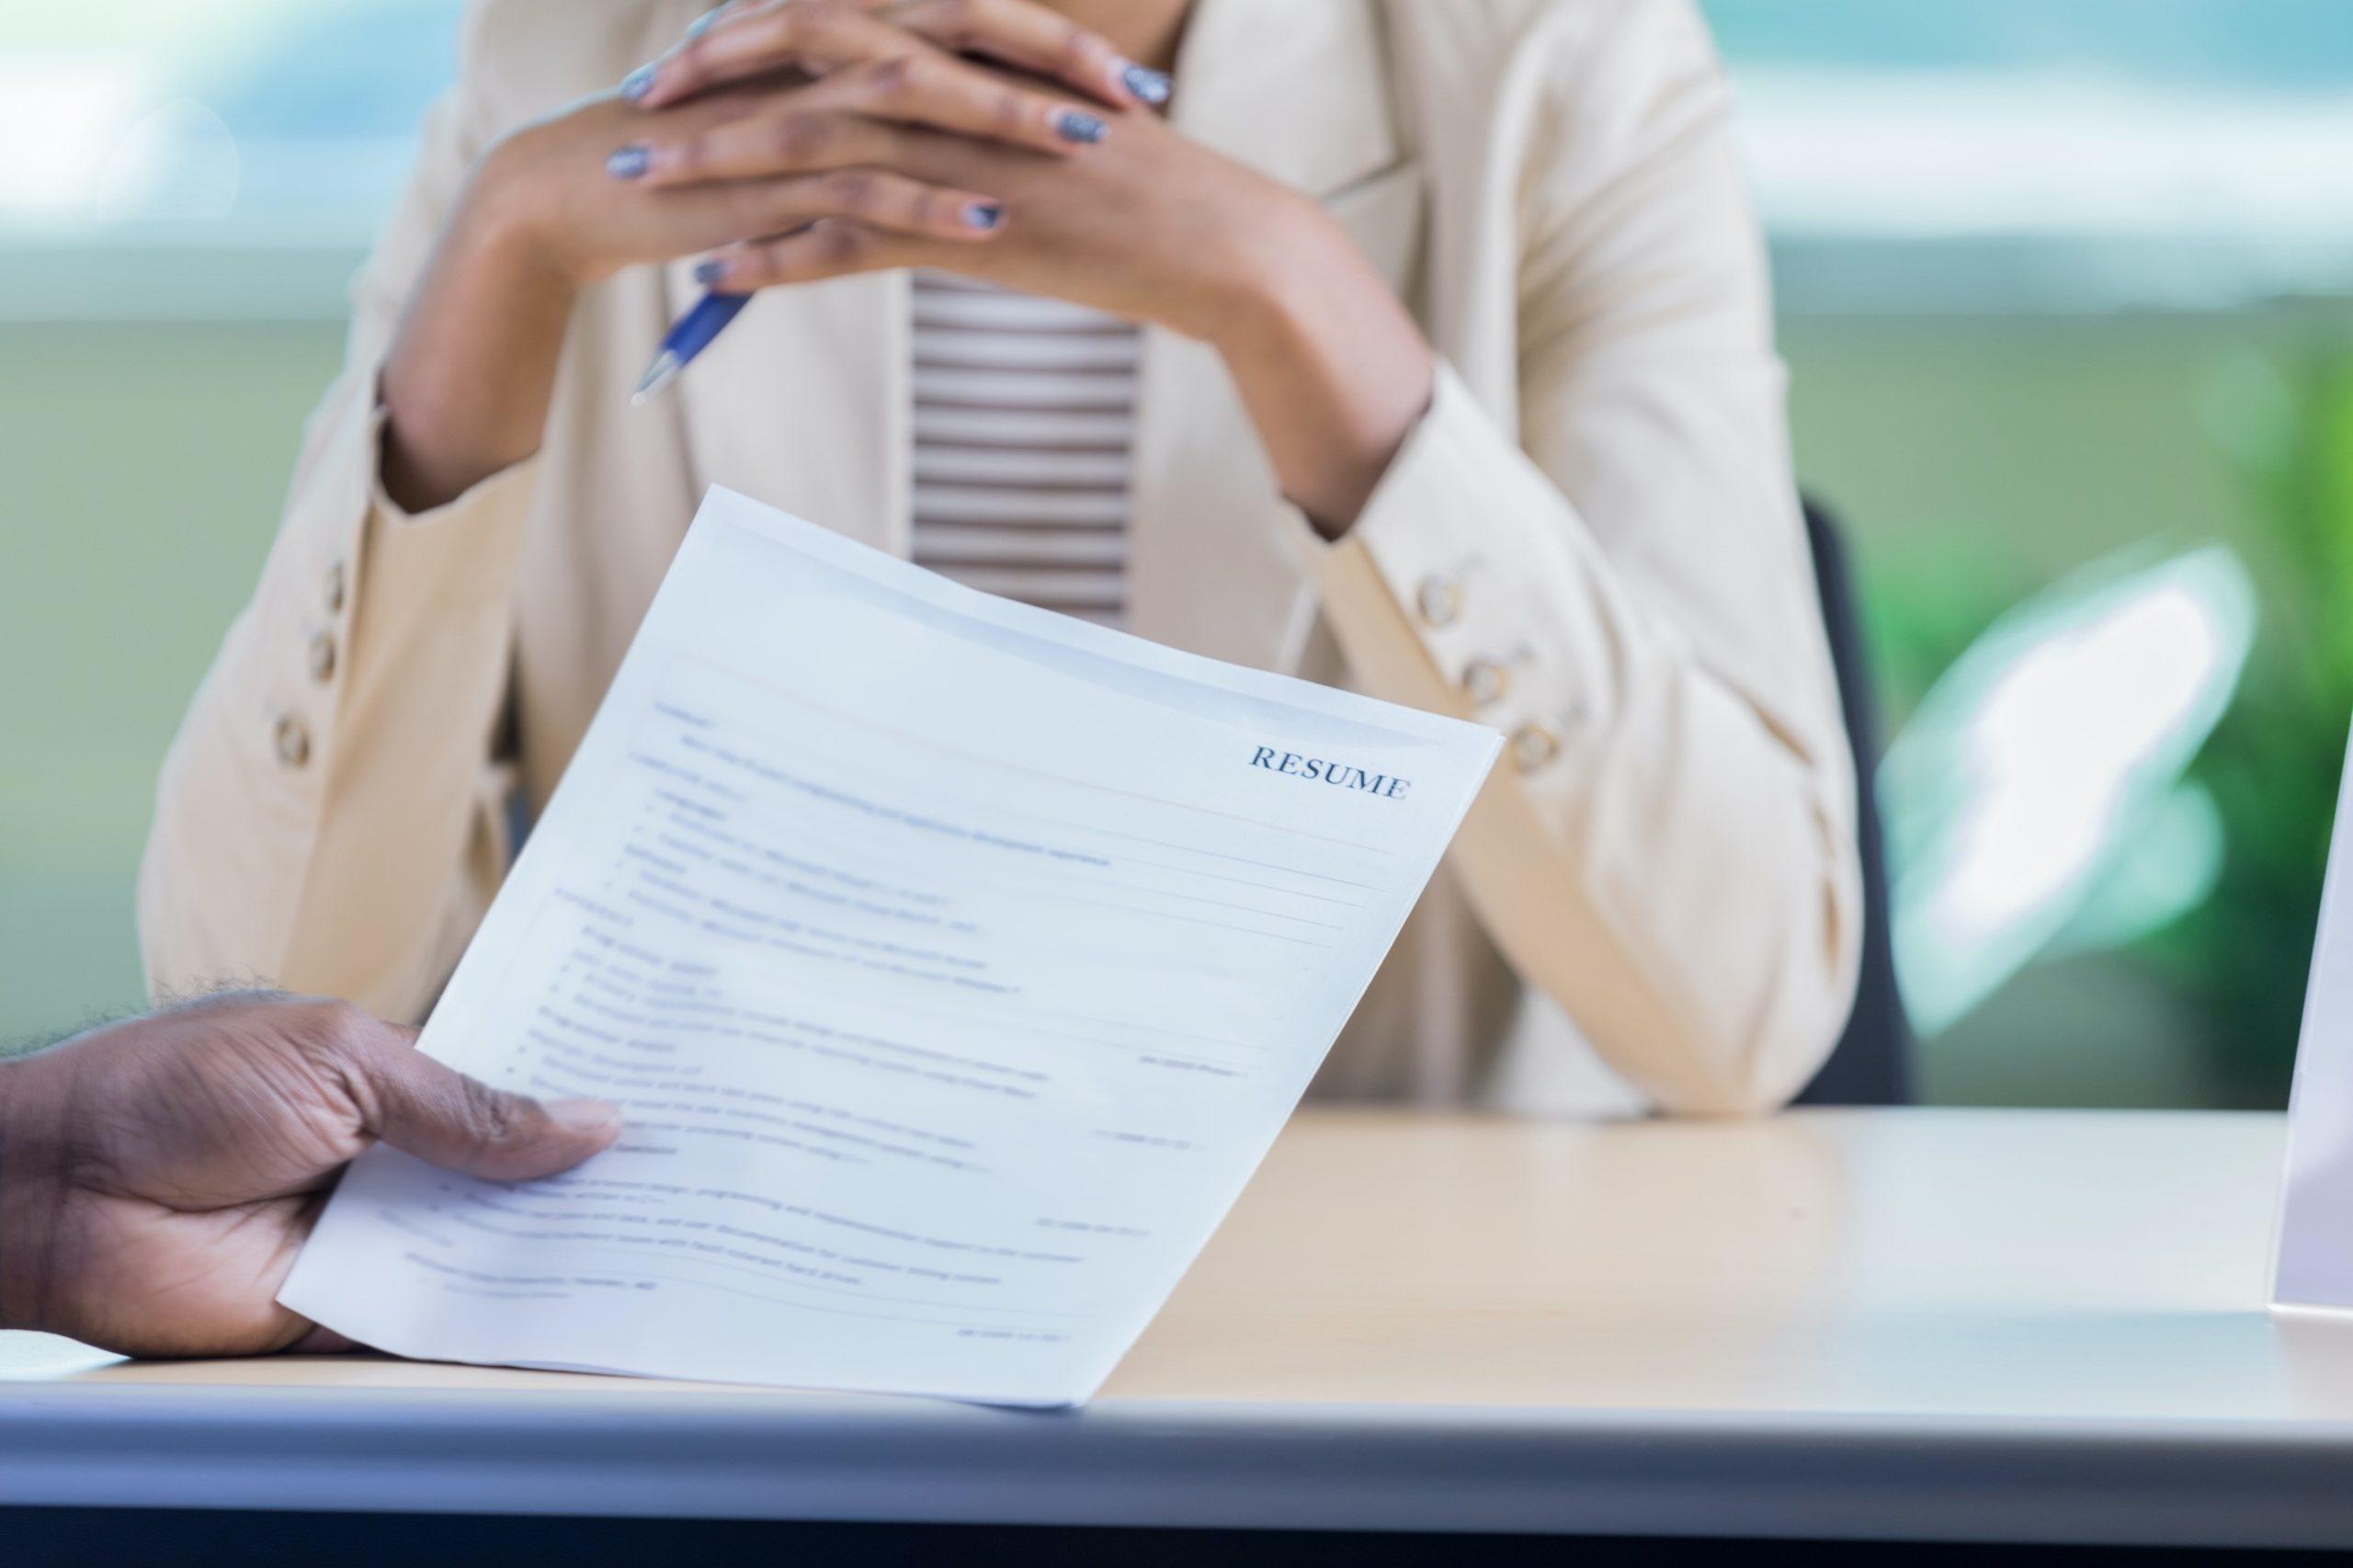 hands holding resume